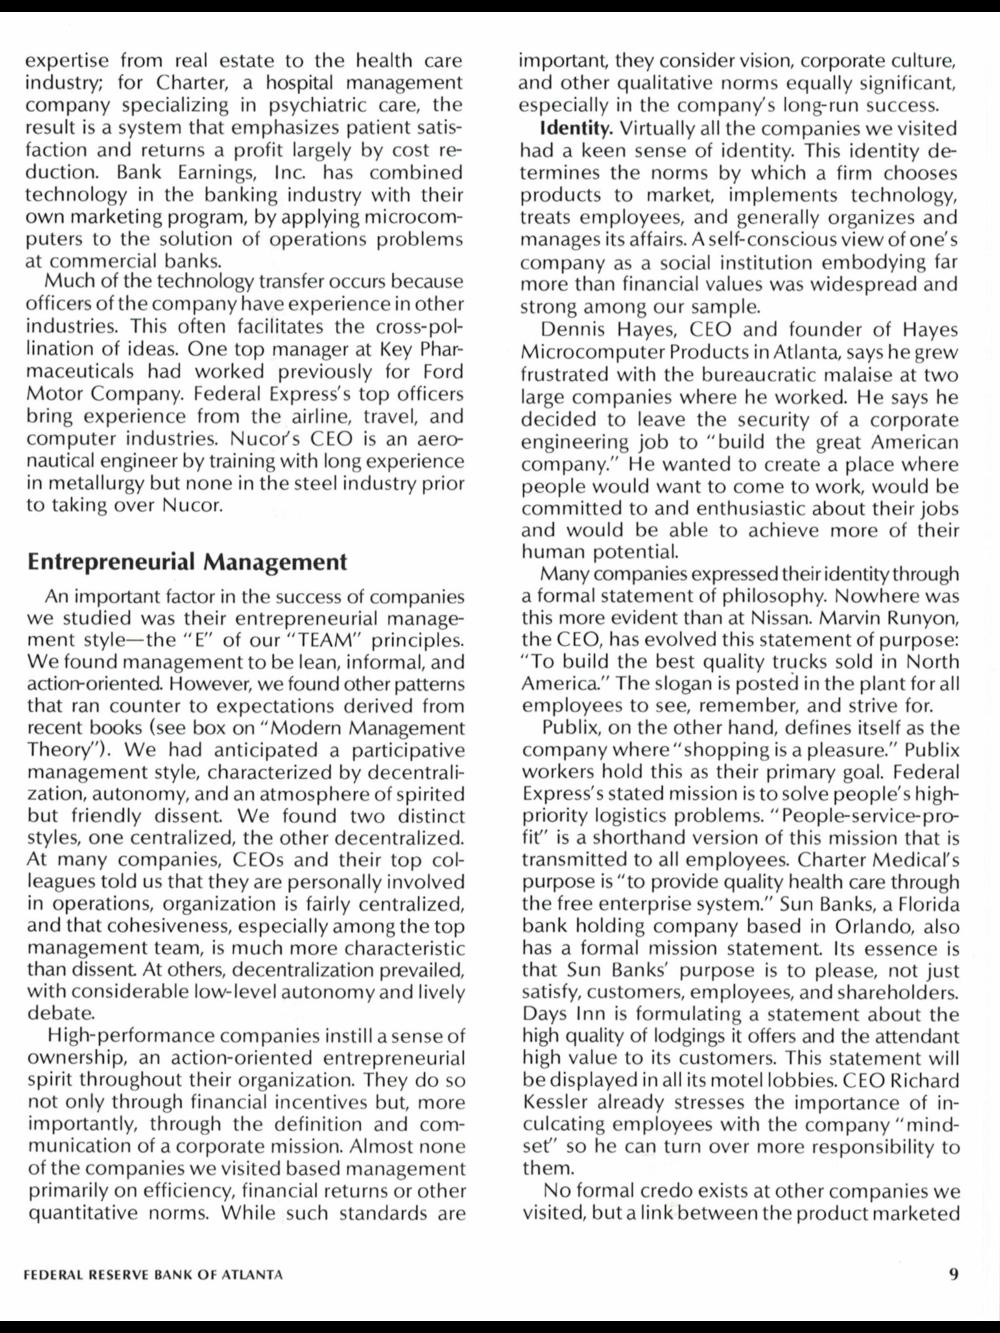 High-Performance-Companies-6